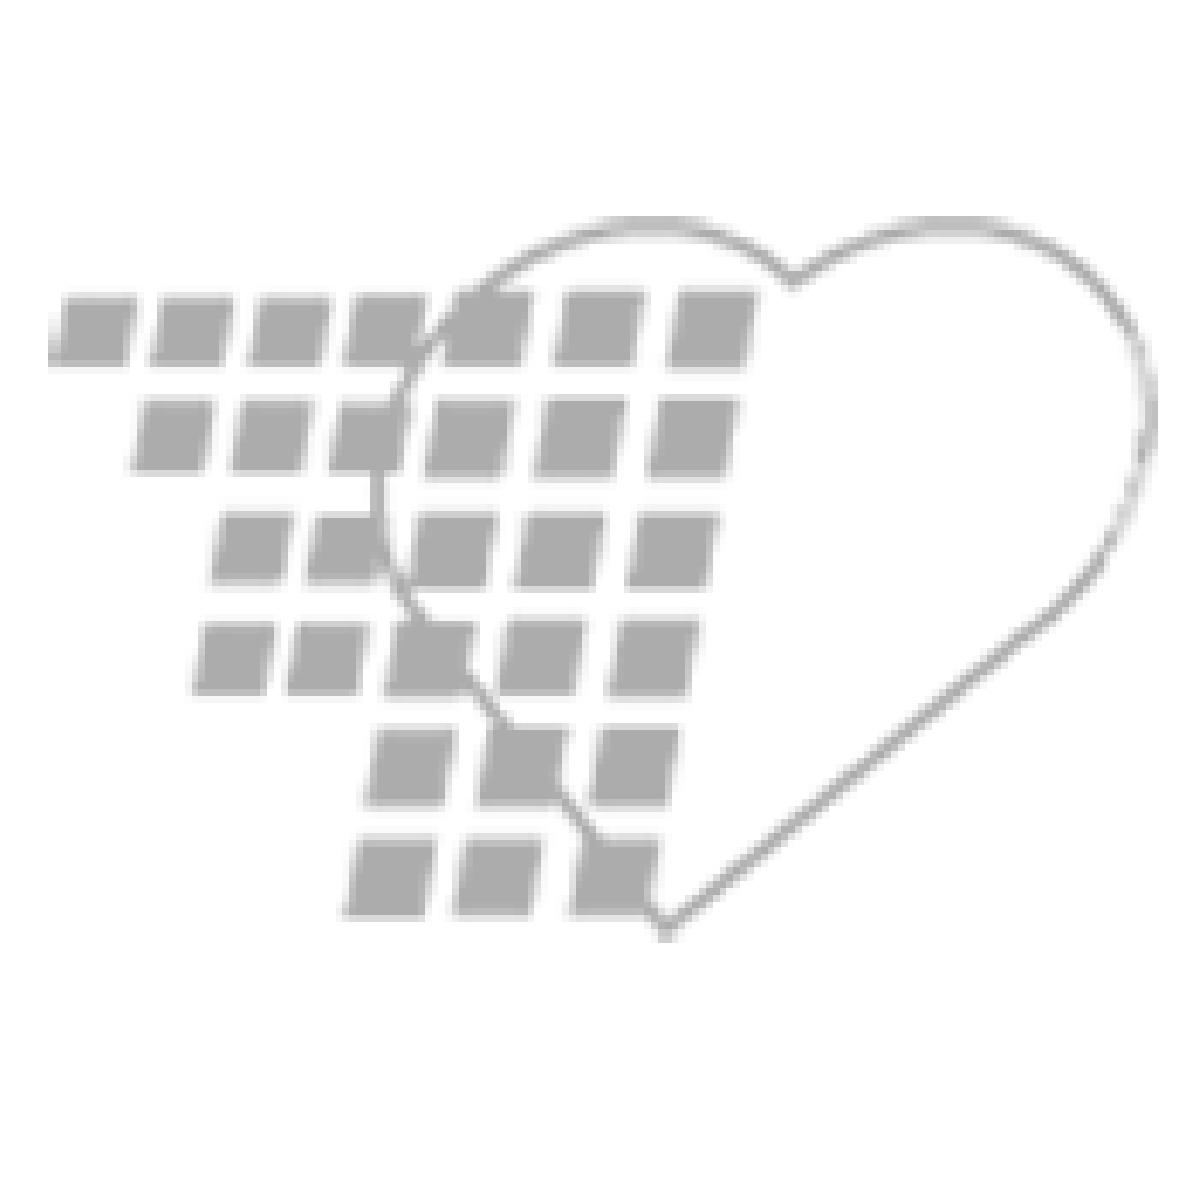 06-93-6923 Demo Dose® Glycopyrrolat (Robinl )0.2mg/mL 1mL